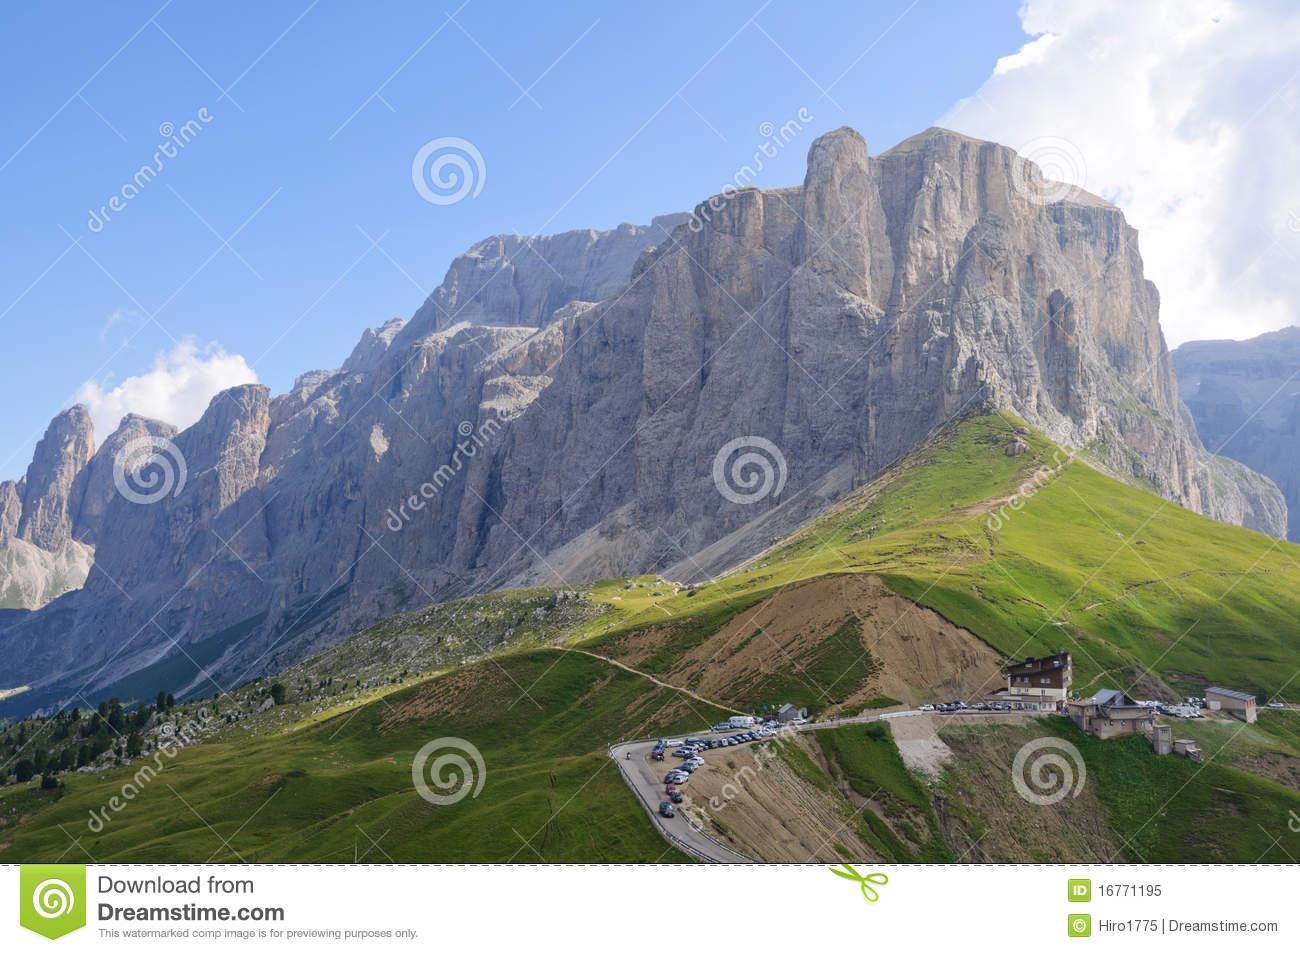 The Sella Massif Group.